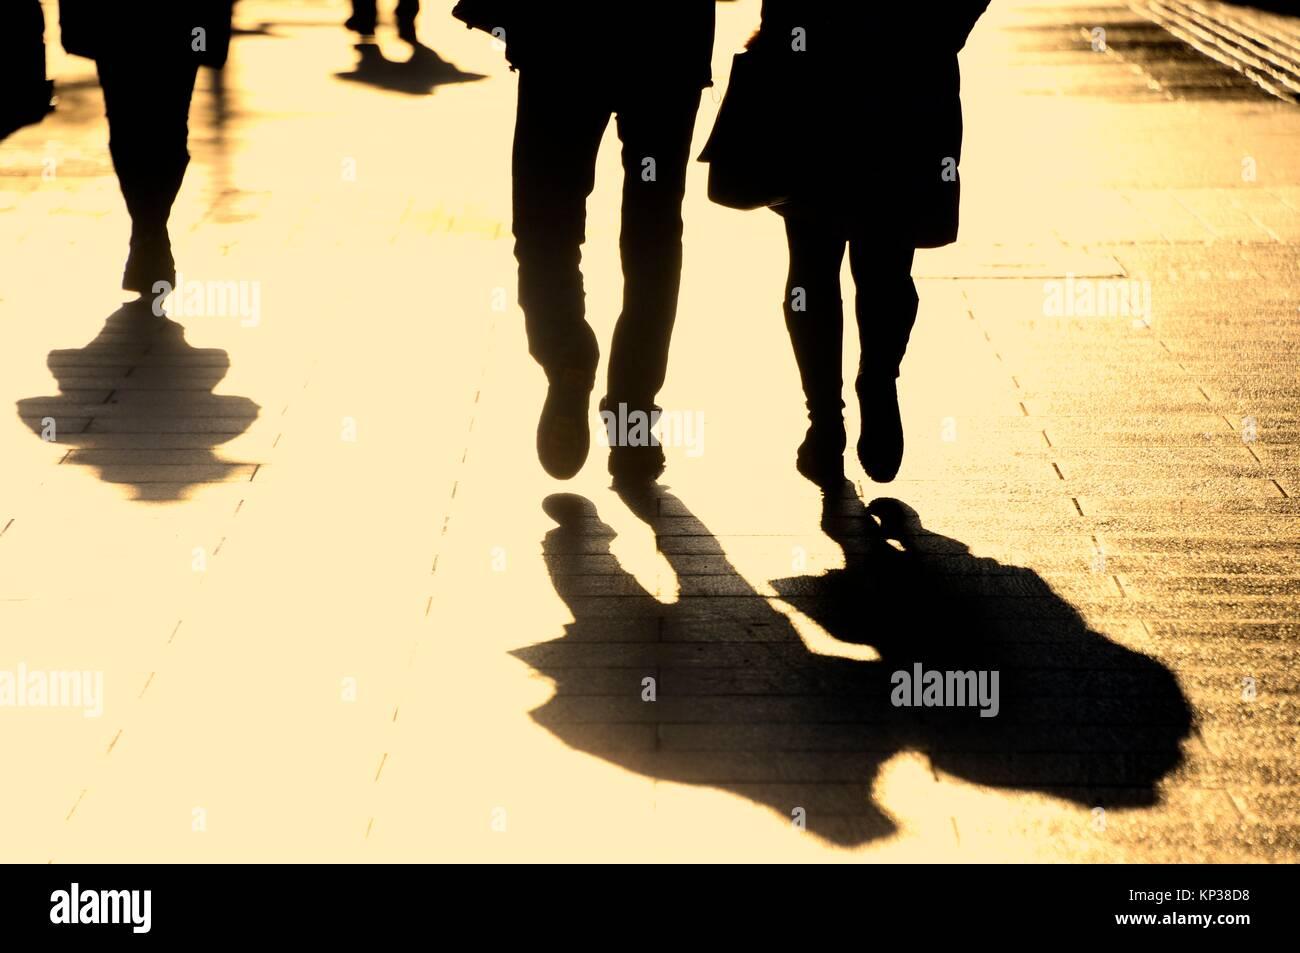 people walking the street, backlit, shadows, Piotrkowska street - main promenade street in Lodz, Lodz, Poland, Europe, - Stock Image